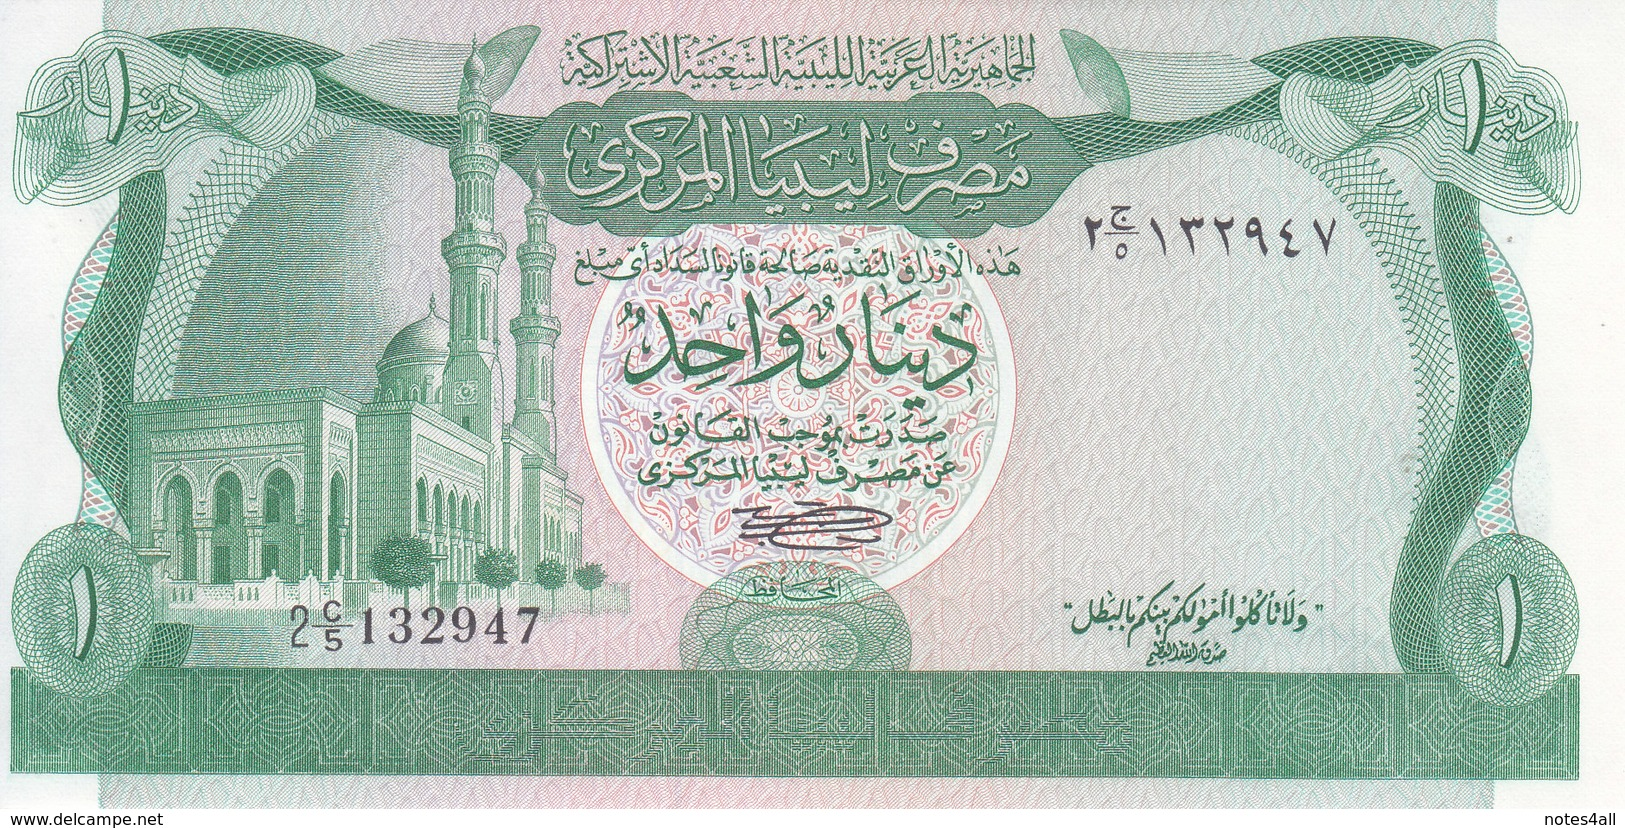 LIBYA 1 DINAR 1981 P-44a SIG/SHERLALA UNC */* - Libye